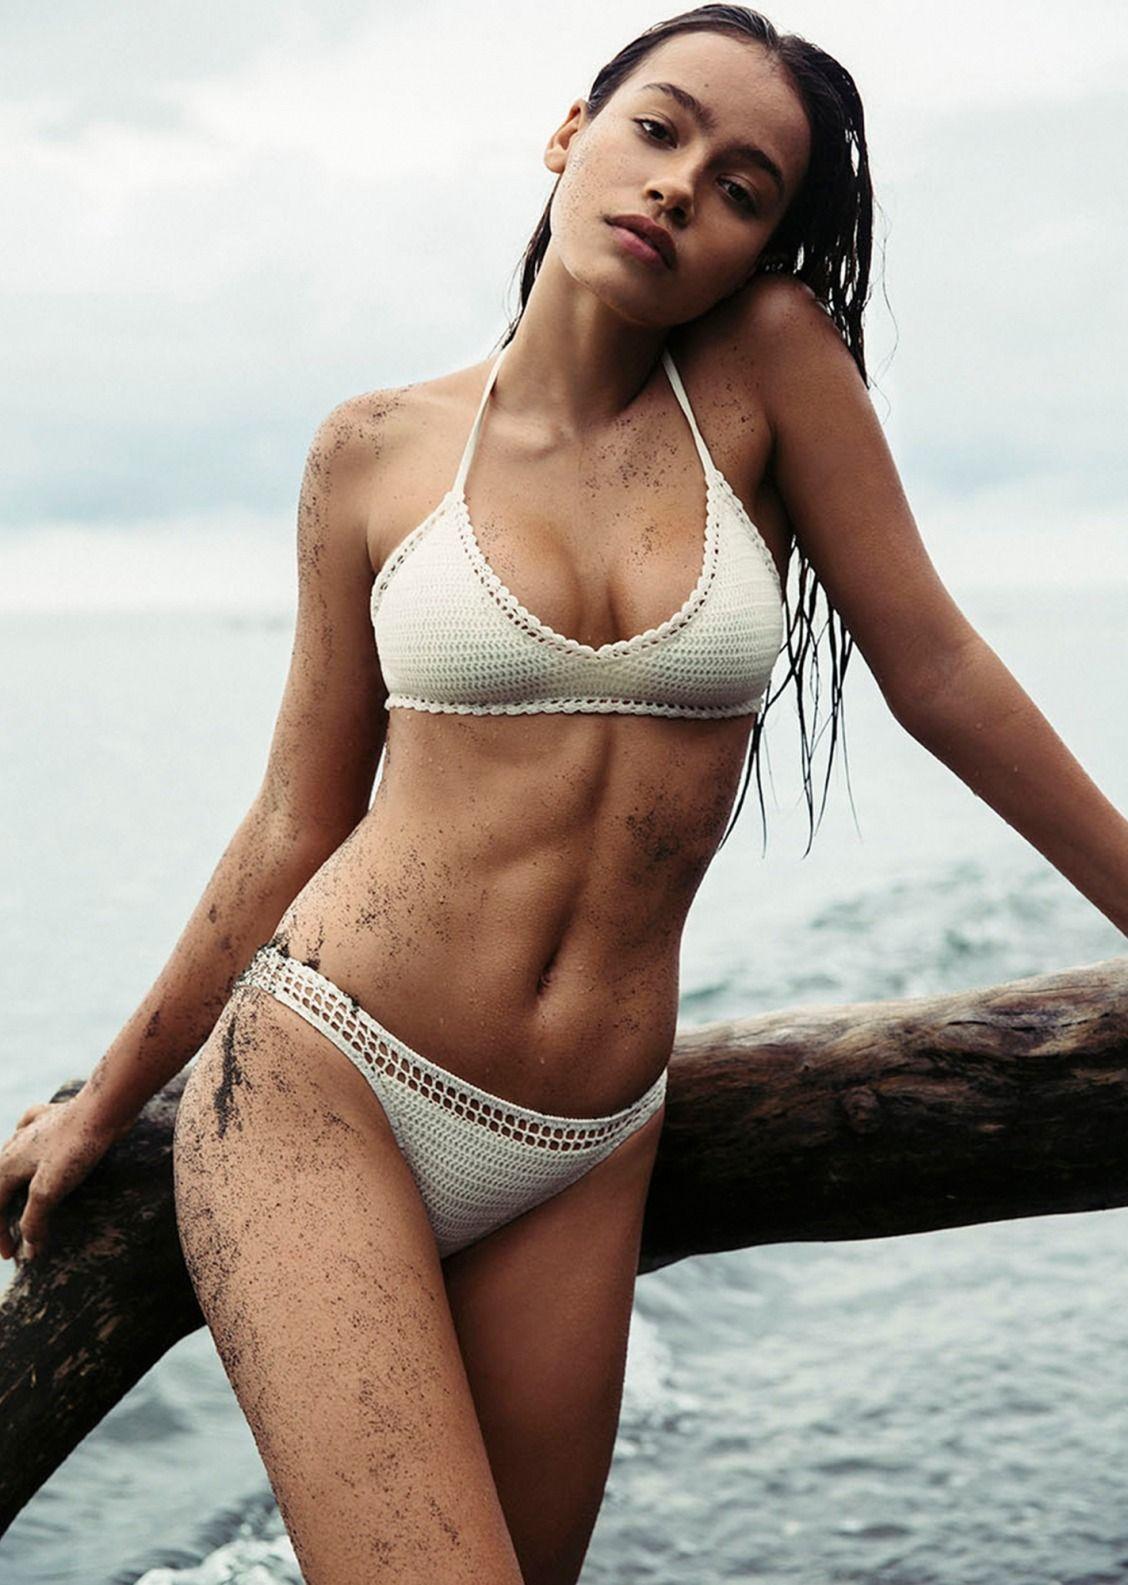 8baa92b3cc47 Hippie Hooray Tali Bikini Top   Billabong US   f a d e t o w h i t e ...